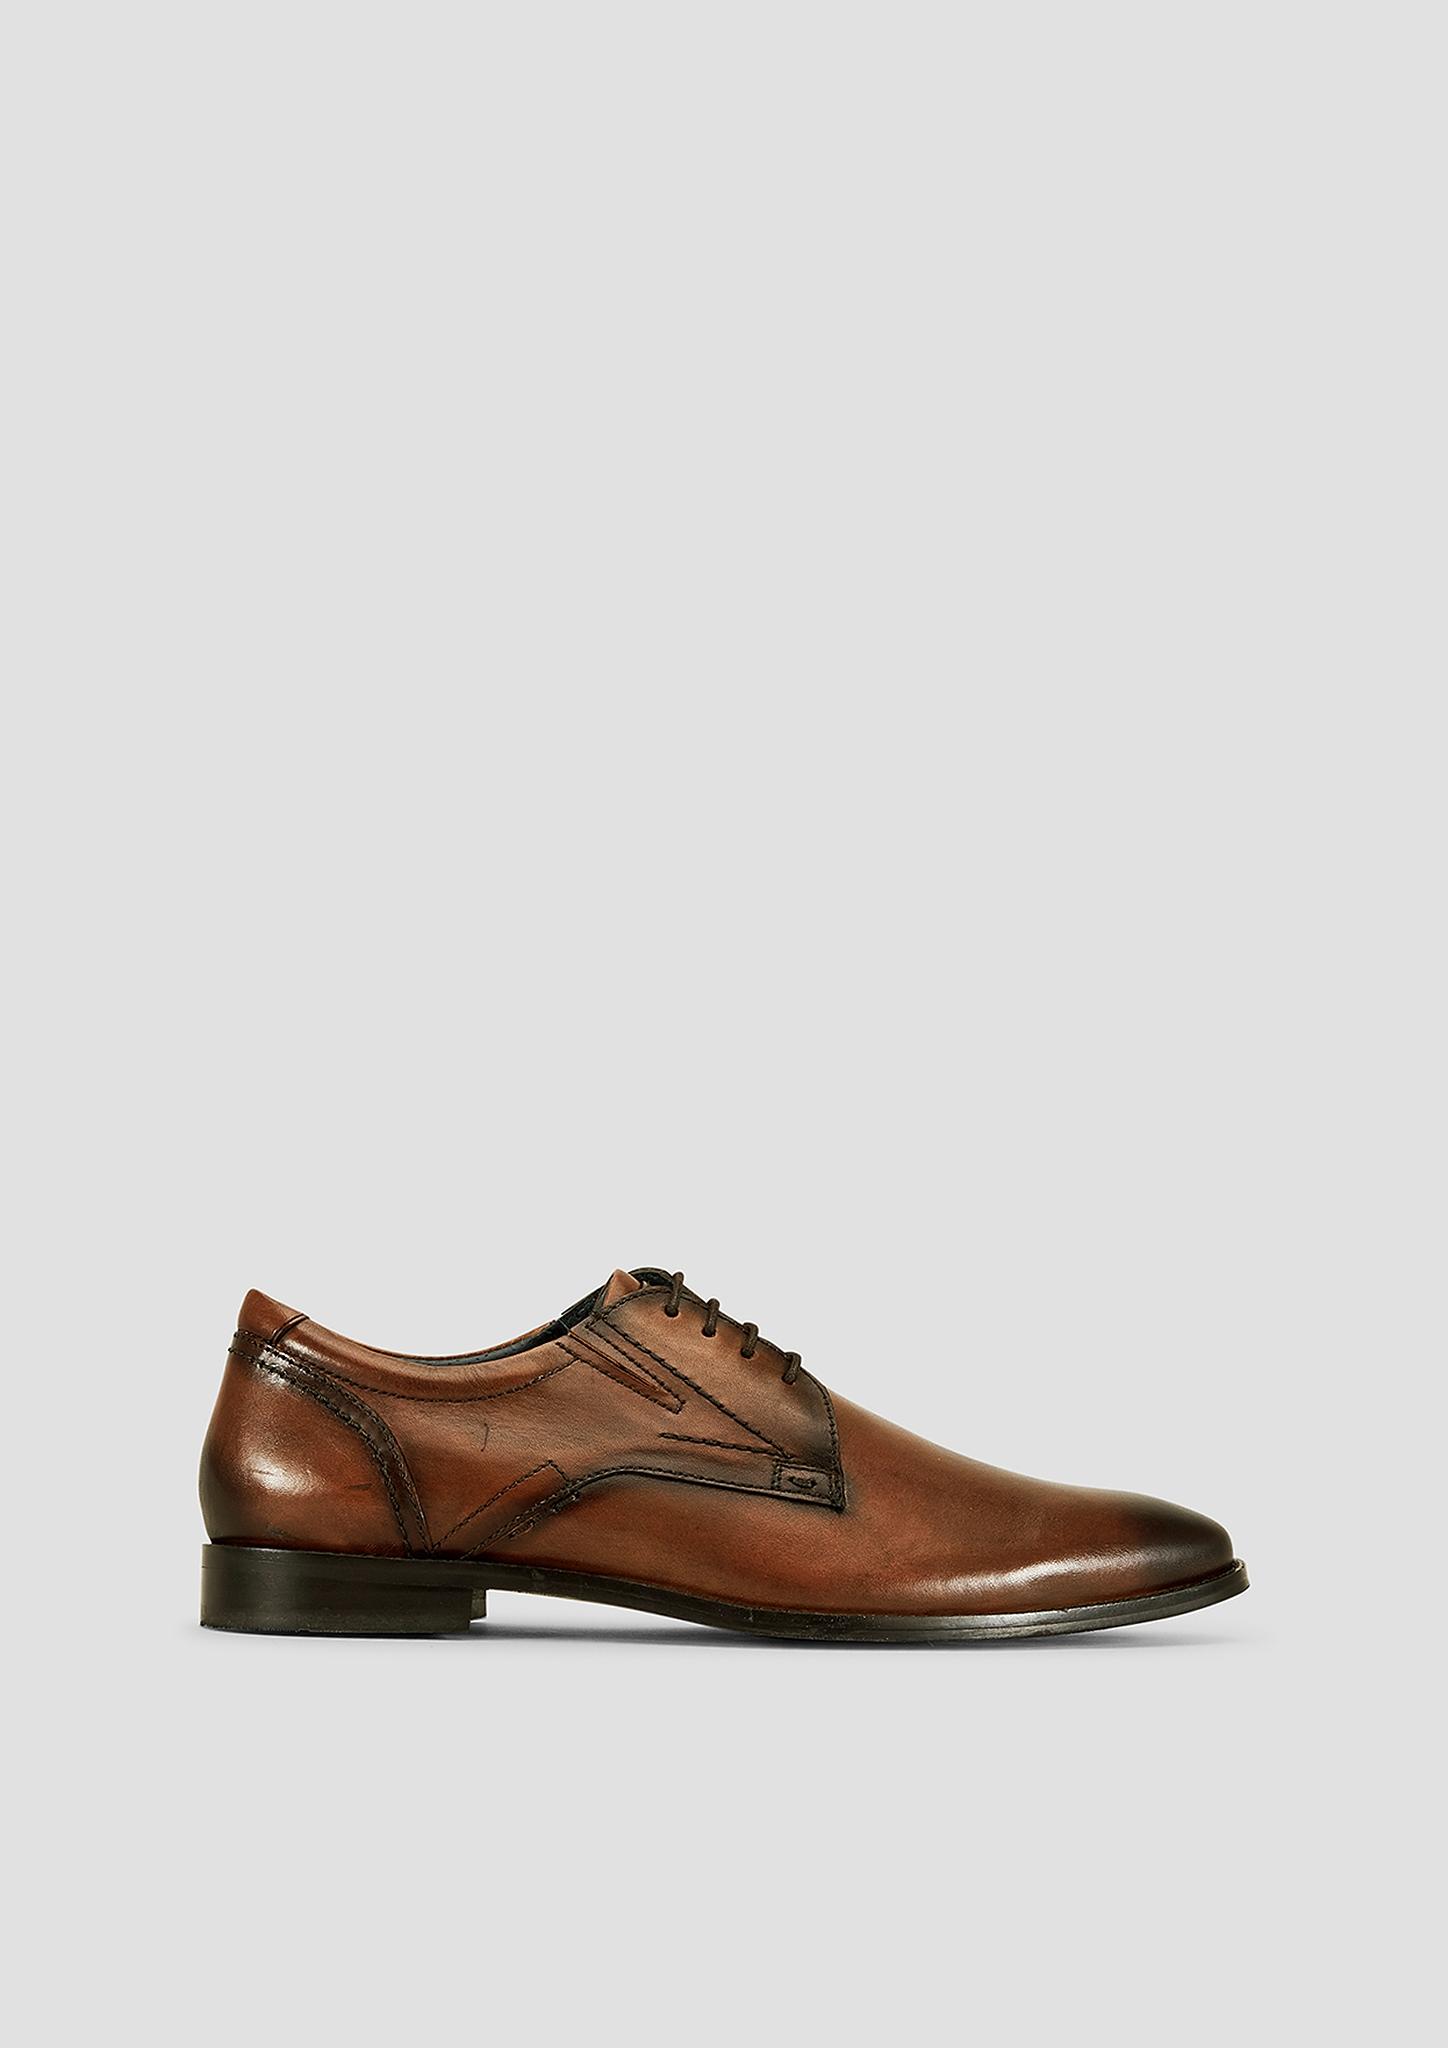 Lederschnürer | Schuhe | Braun | Obermaterial aus leder| futter und decksohle aus leder| laufsohle aus synthetik | s.Oliver